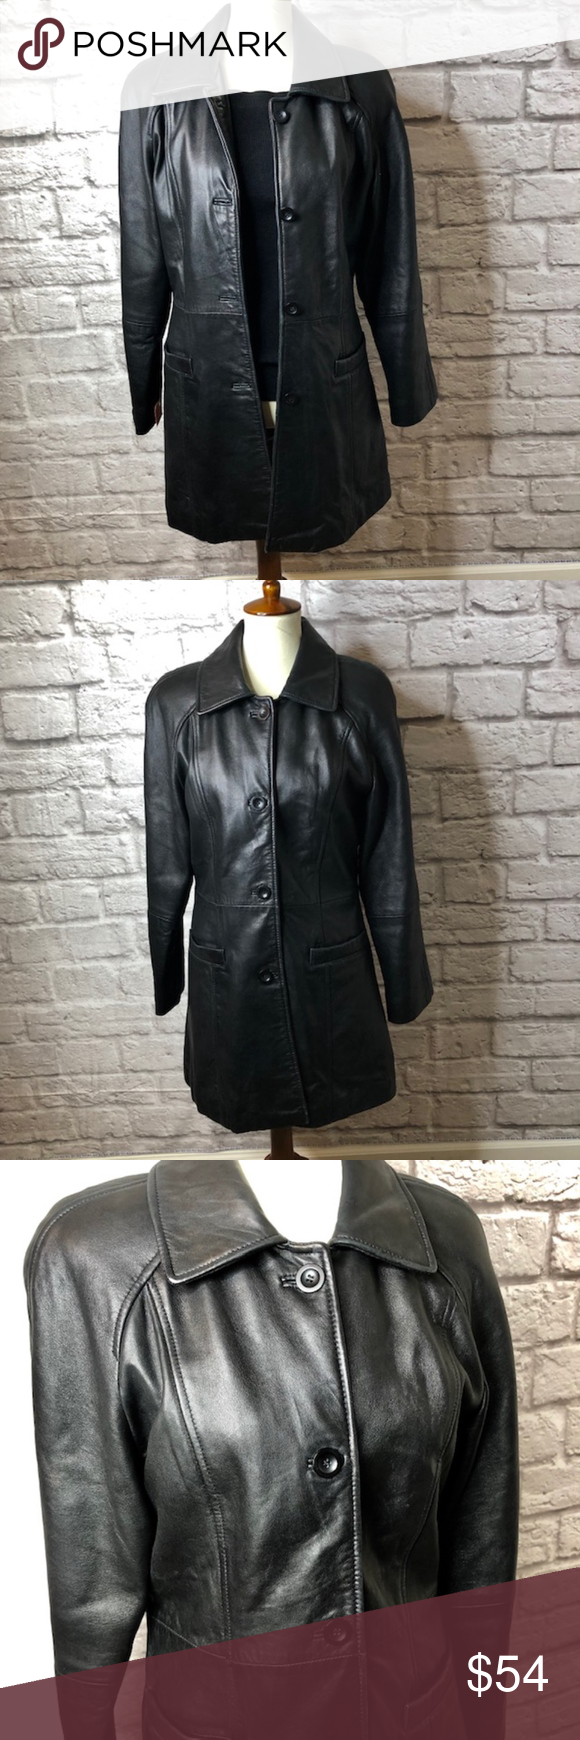 Jones New York Genuine Leather Black Coat Jones New York Genuine Leather Black Coat Size Medium Elegant Stunning Sof Stylish Jackets Black Coat Jones New York [ 1740 x 580 Pixel ]